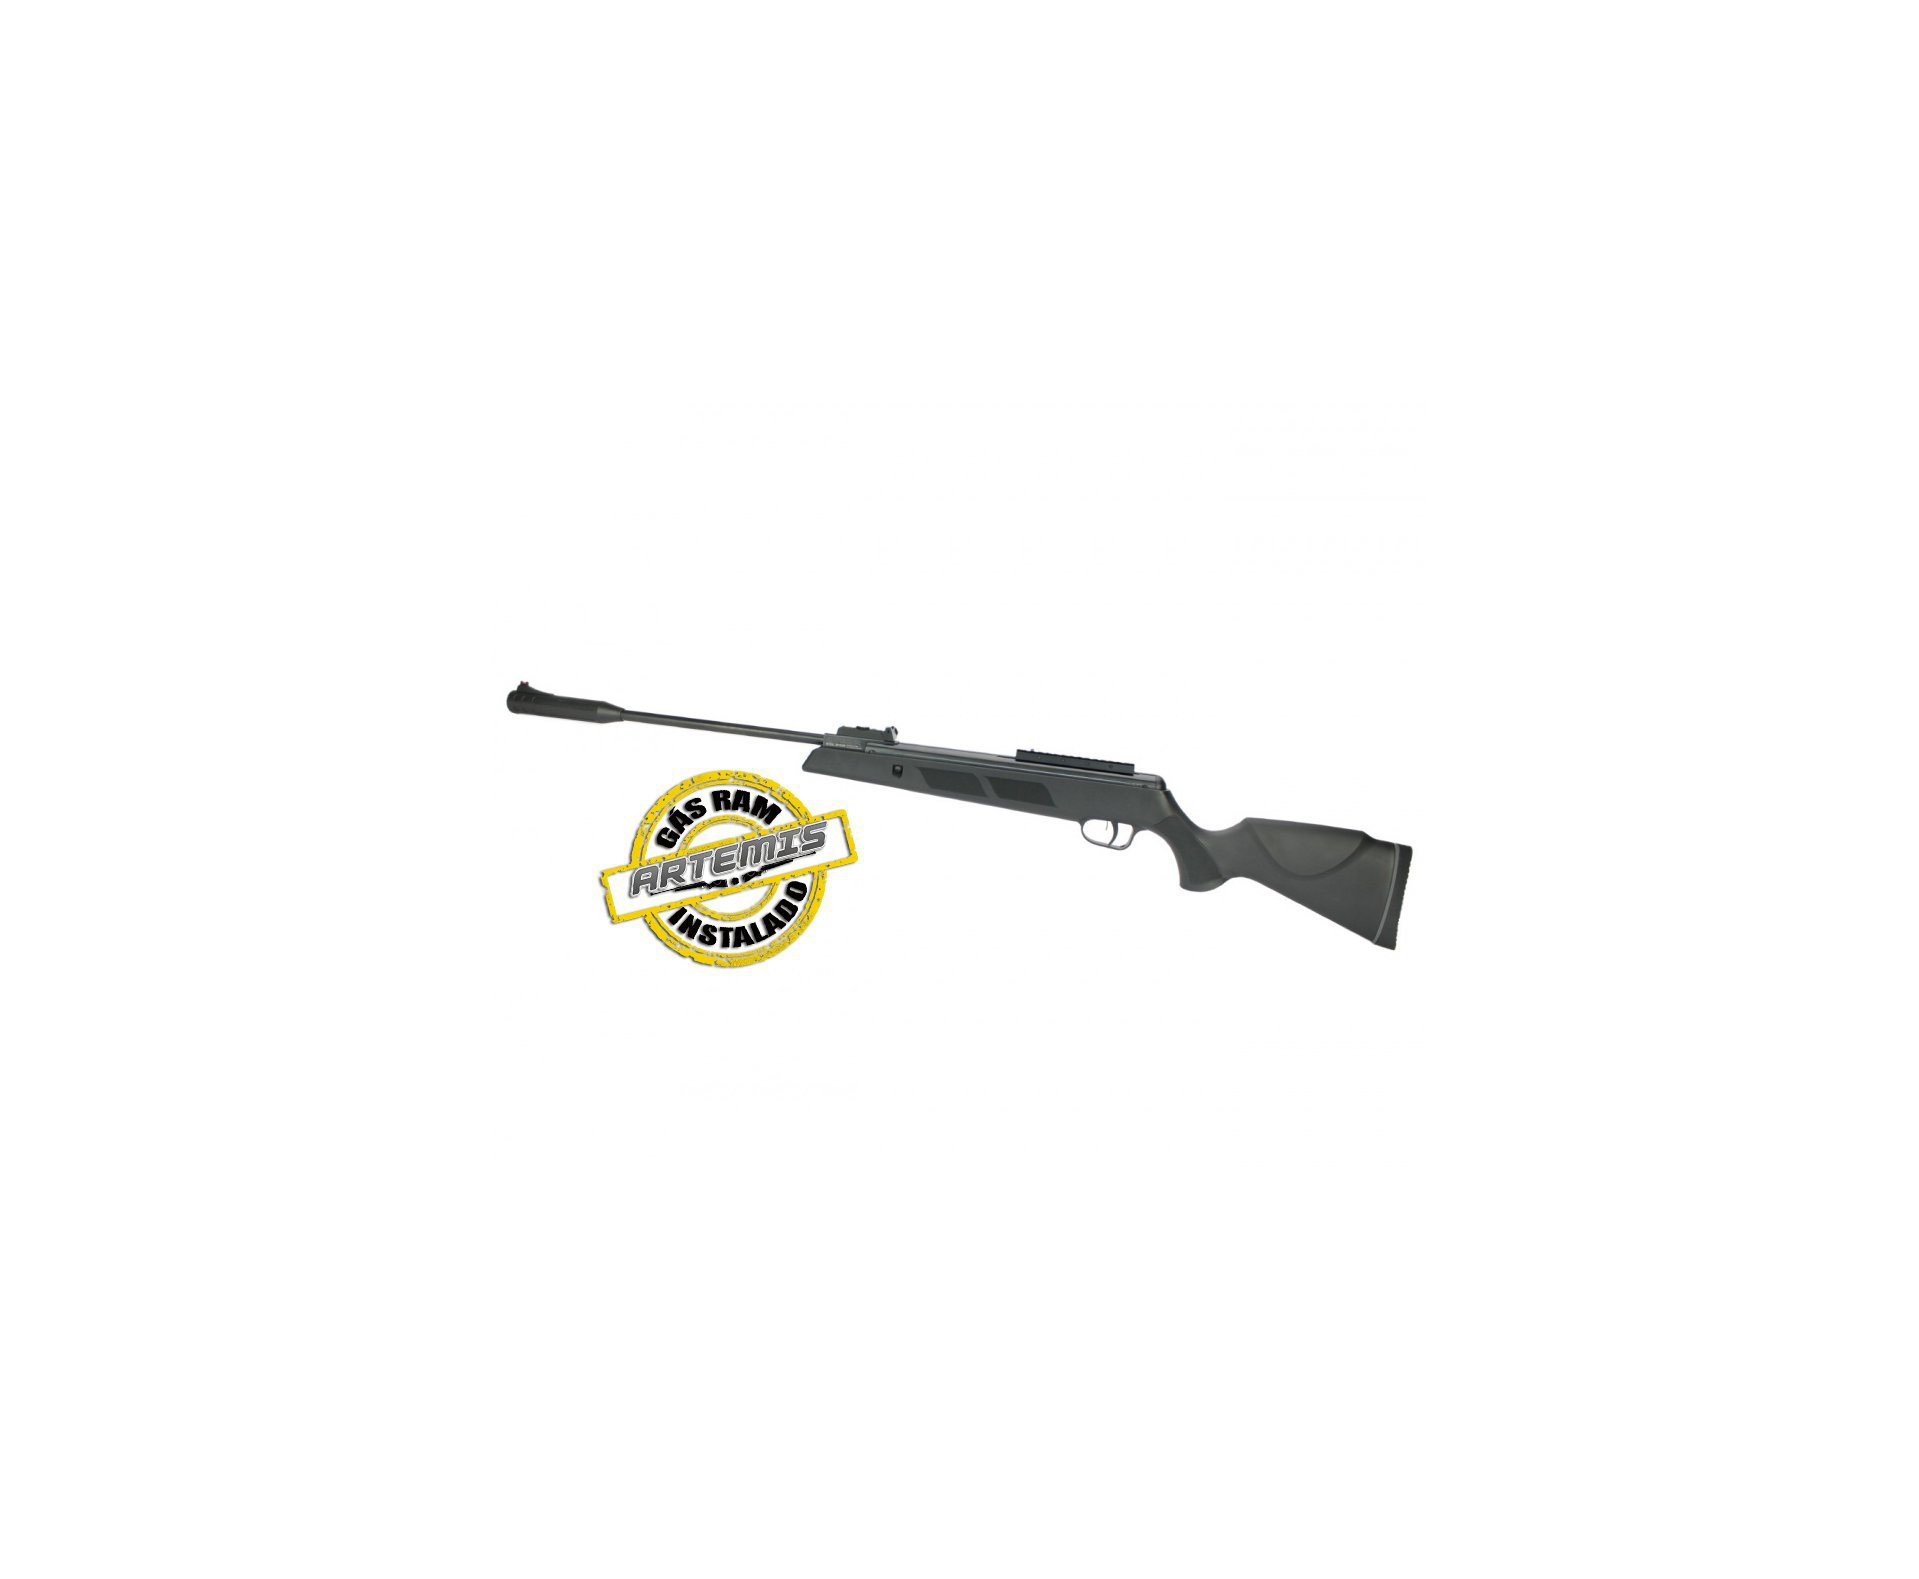 Carabina De Pressão Black Hawk Gas Ram 70kg 4.5mm Artemis